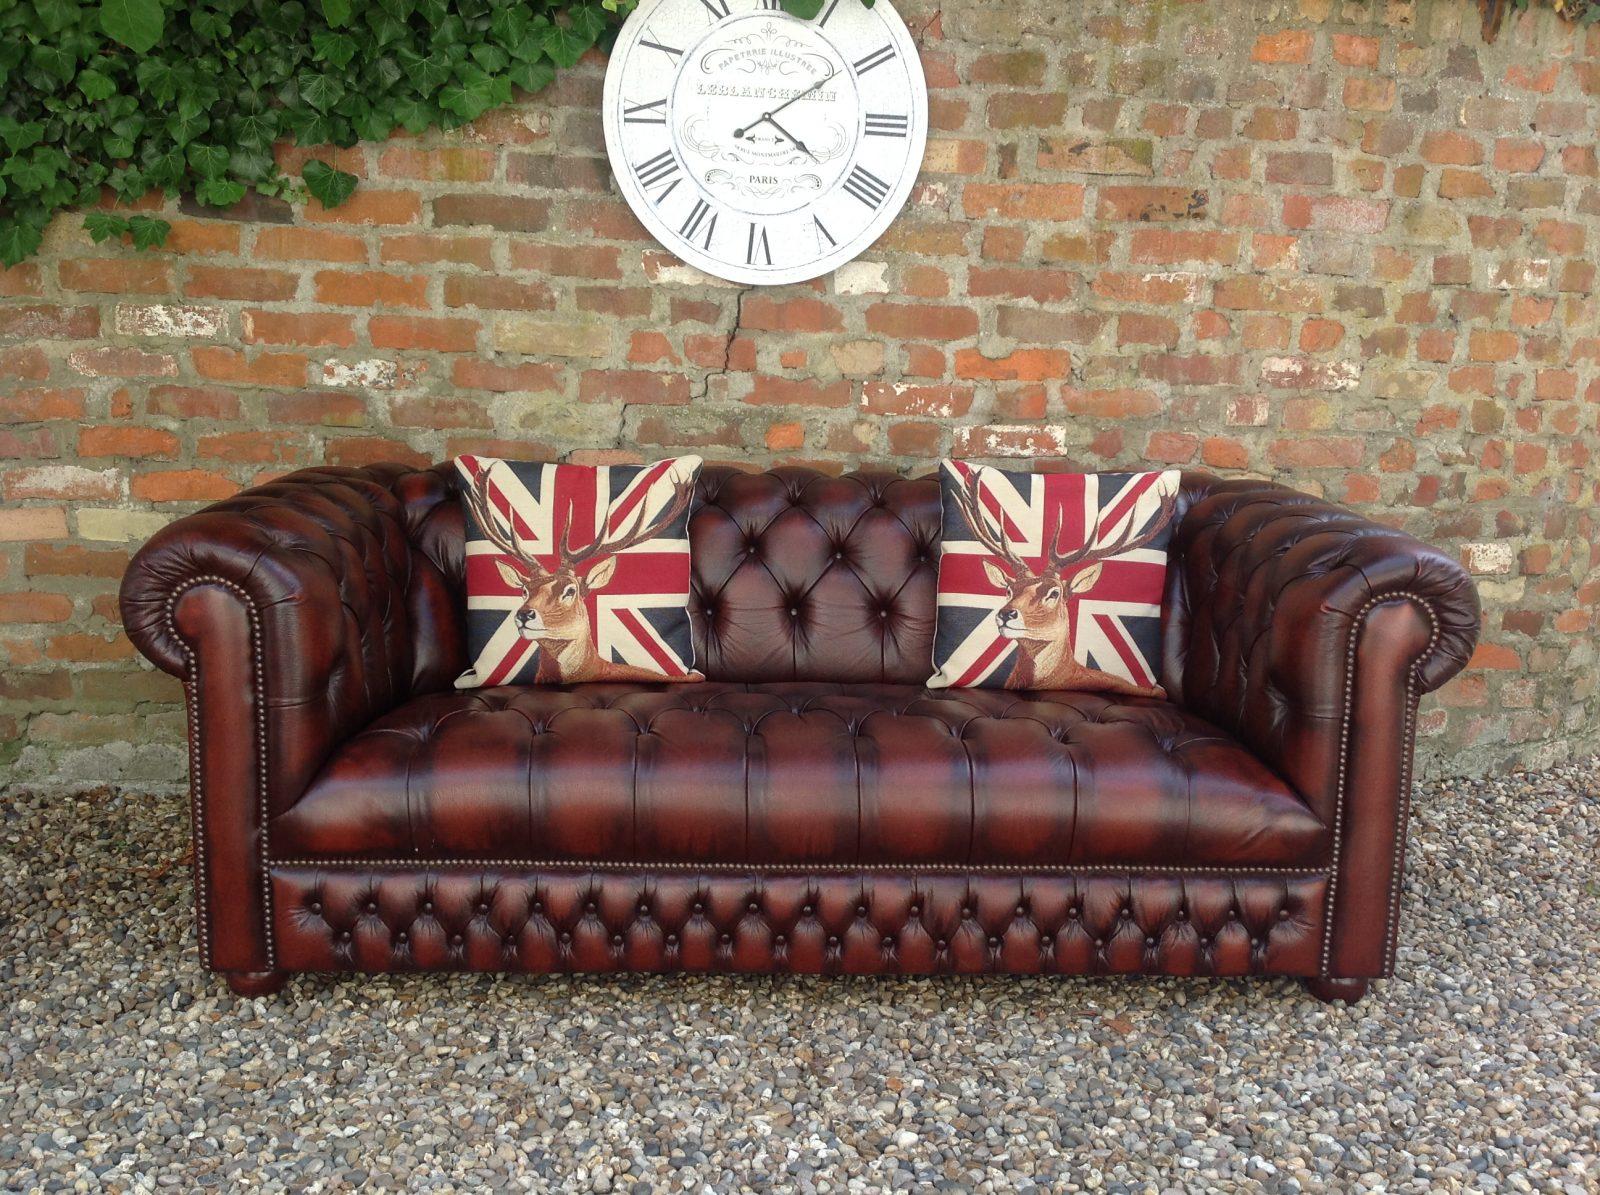 Antique Chestnut Saxon 3 Seater Chesterfield Sofa.